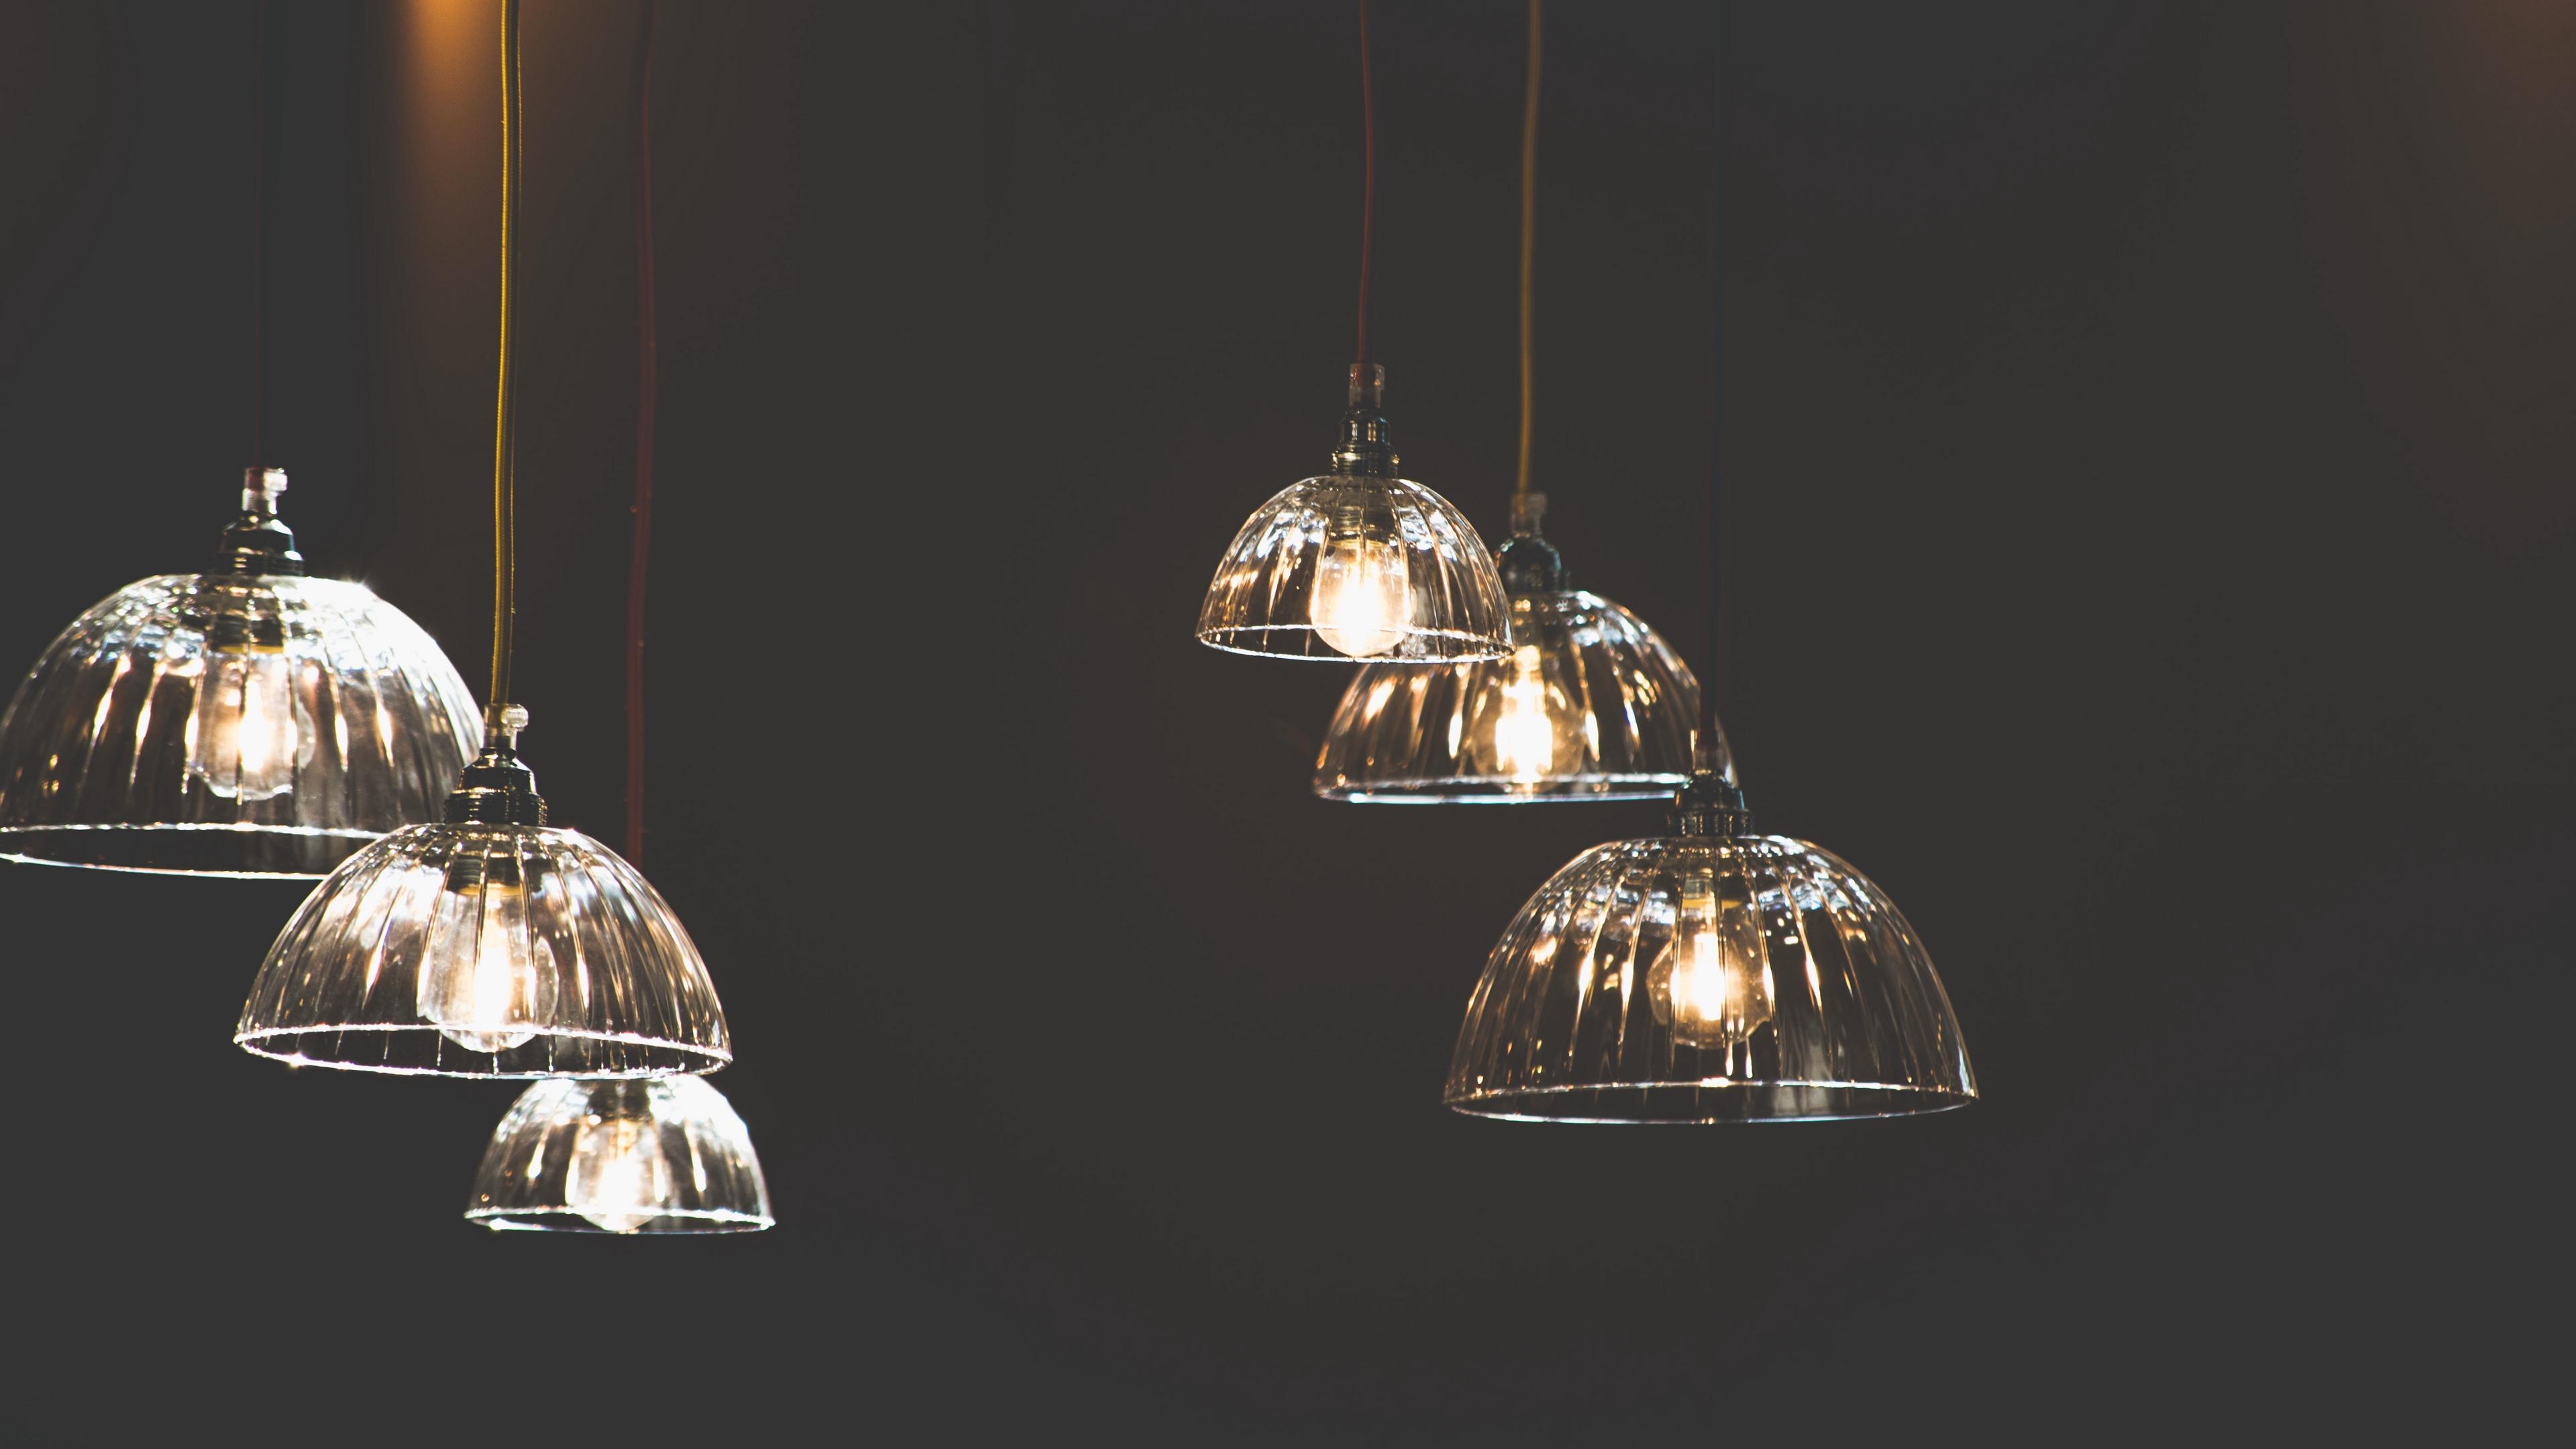 chandeliers lamps light 4k 1540574388 - chandeliers, lamps, light 4k - Light, lamps, chandeliers